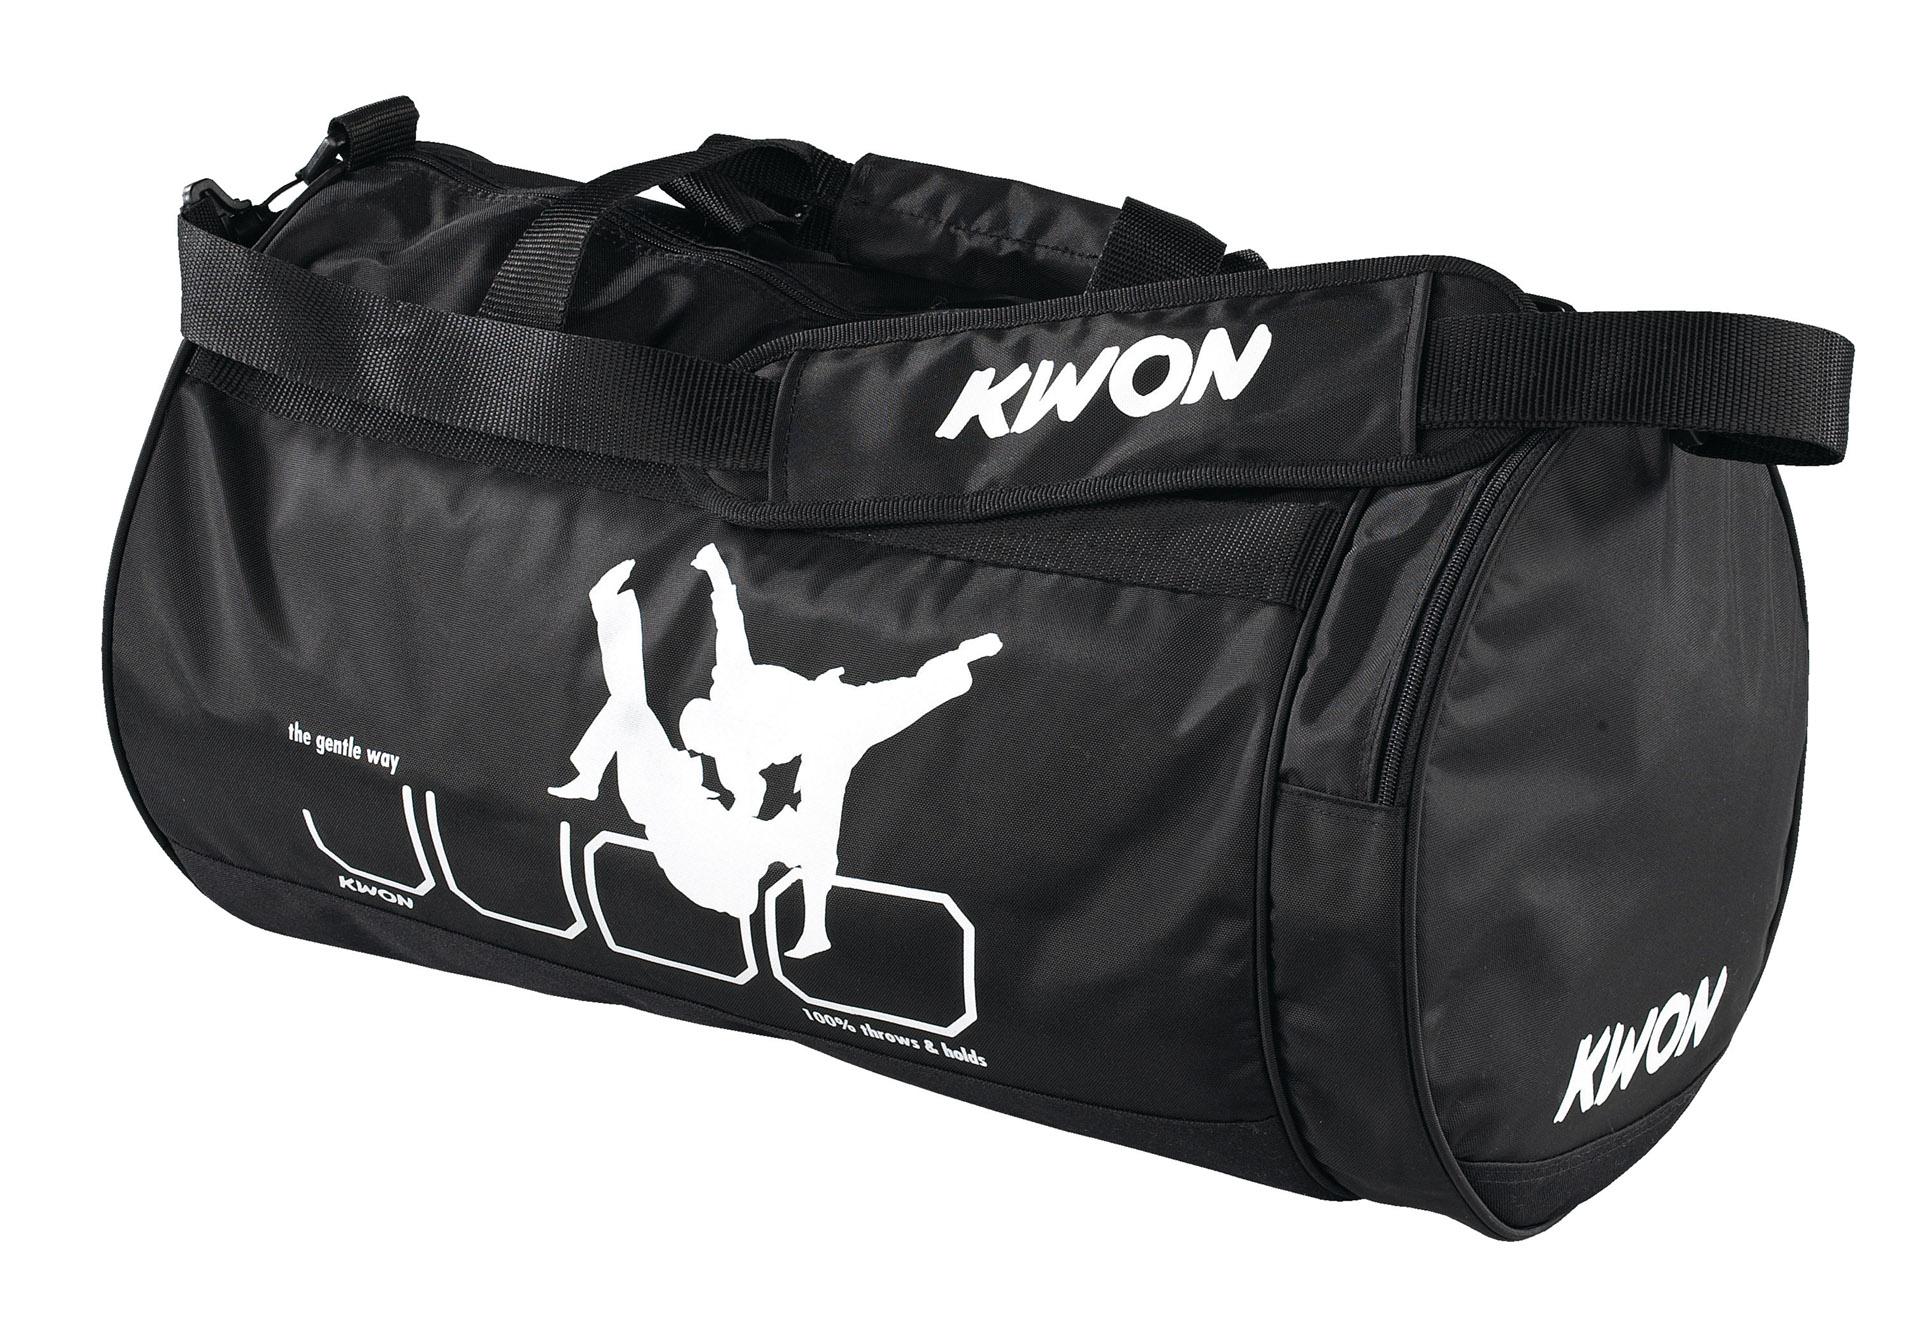 KWON® ClubLine Sporttasche Tasche Trainingstasche Kick Boxen Muay Thai Taekwondo